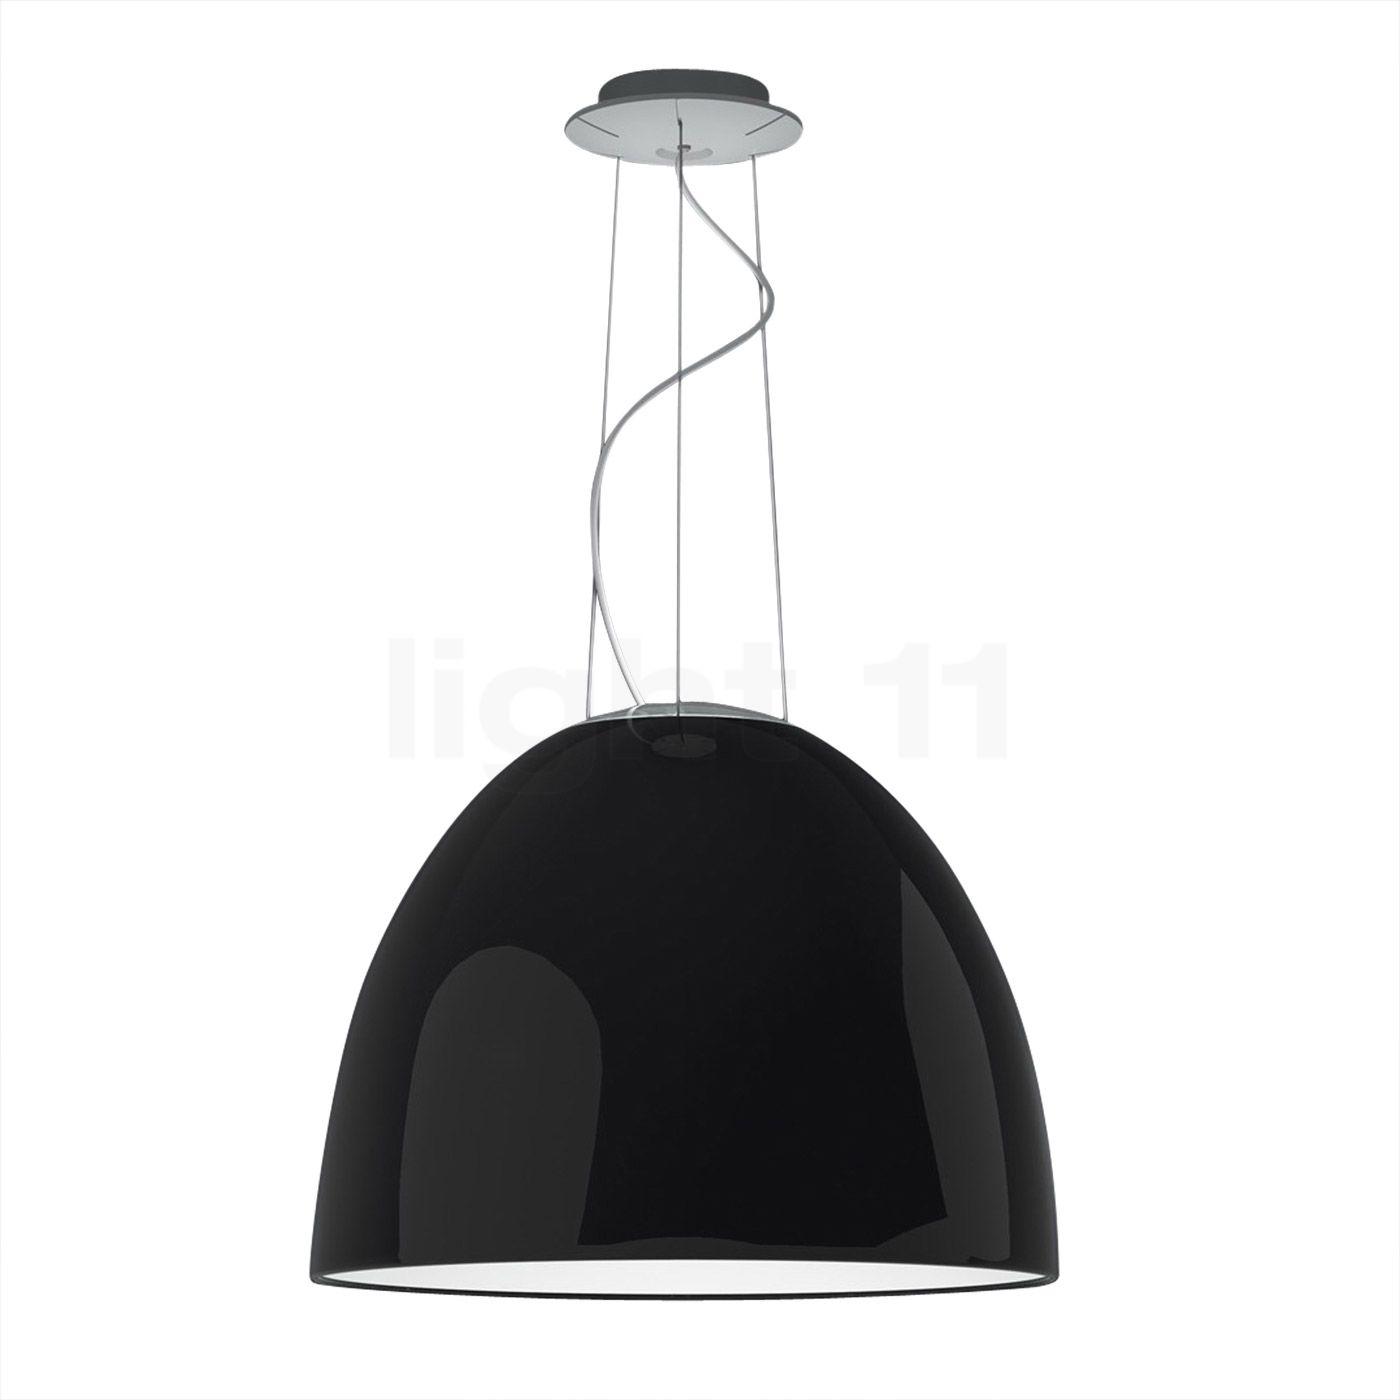 artemide nur gloss halo pendelleuchte kaufen bei. Black Bedroom Furniture Sets. Home Design Ideas